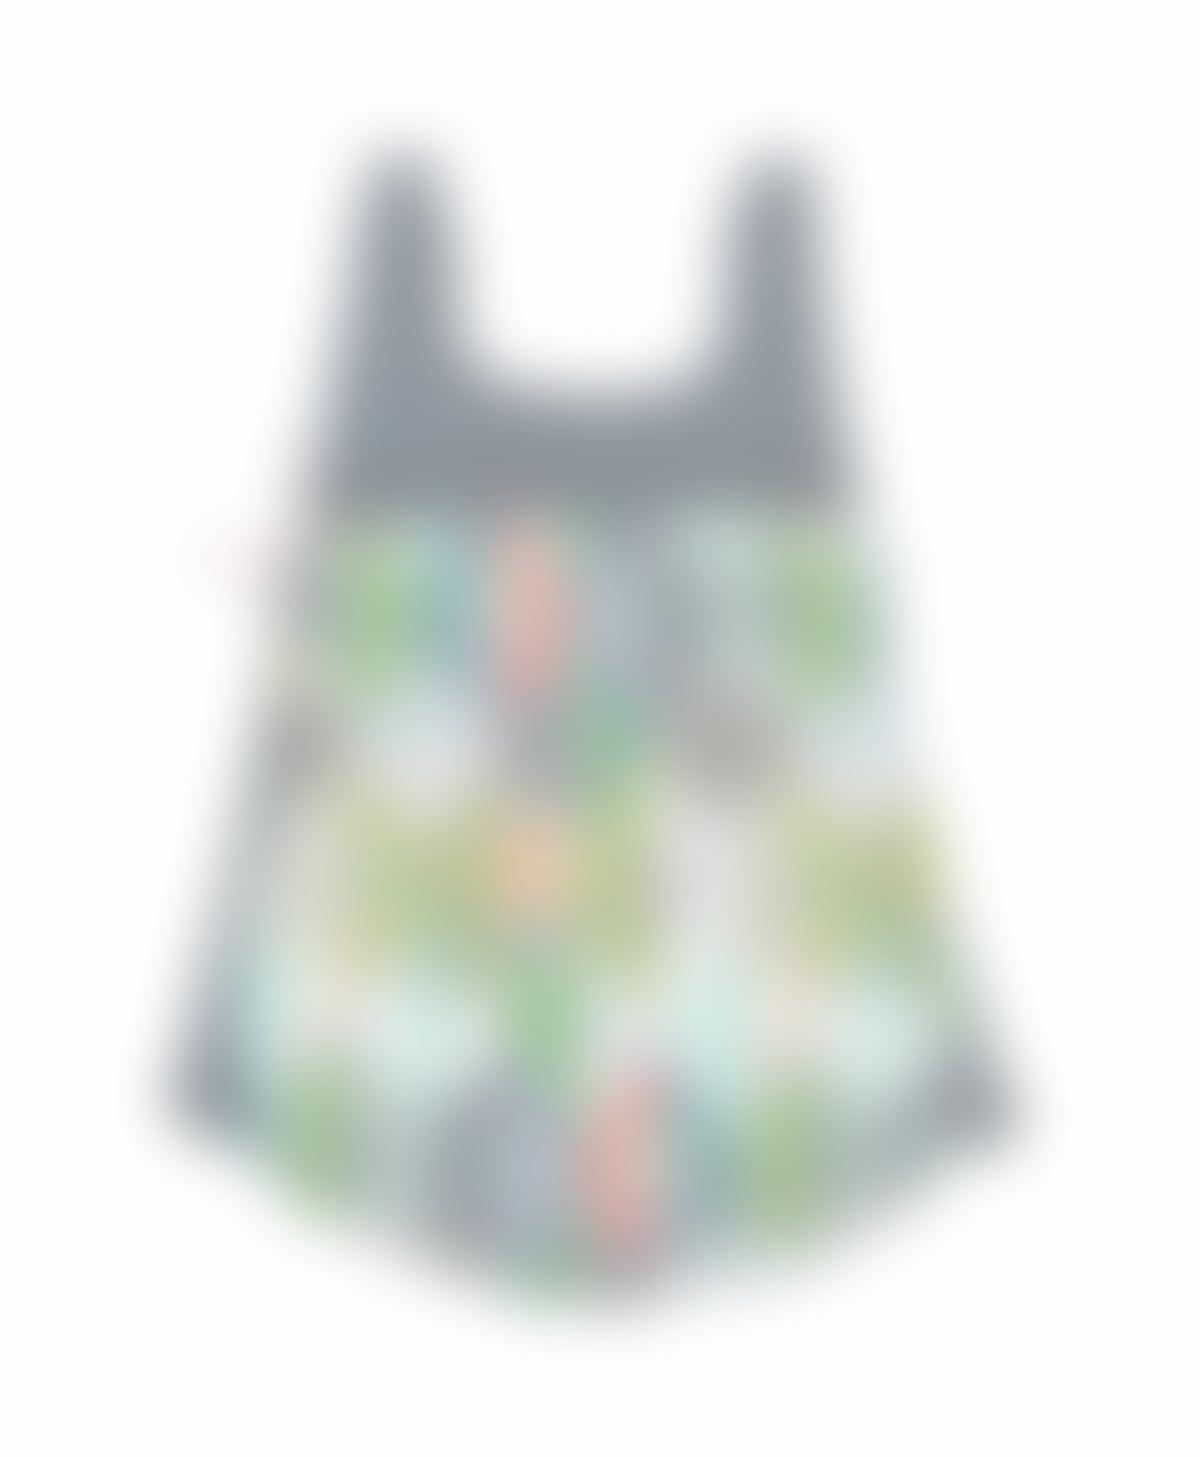 Mochila de tela Naturaleza, Mochila de tela gométrica, Mochila de tela botánica, Mochila tela hojas, Mochila hecha a mano, Mochila original para mujer, ...